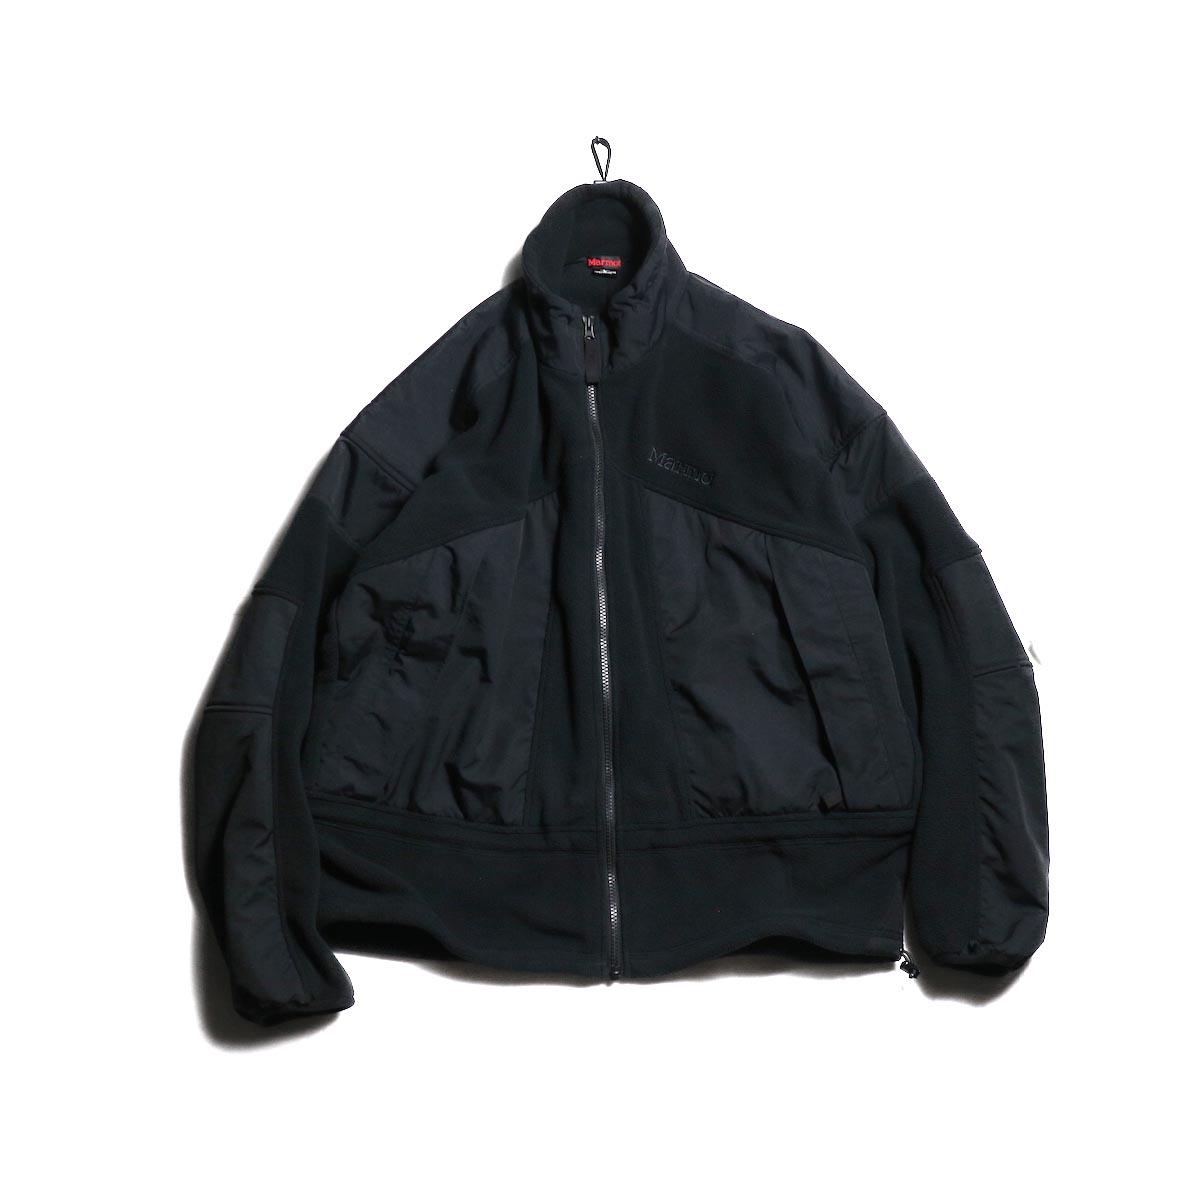 Marmot Histric Collection / Alpinist Tech Sweater (Black×Black)